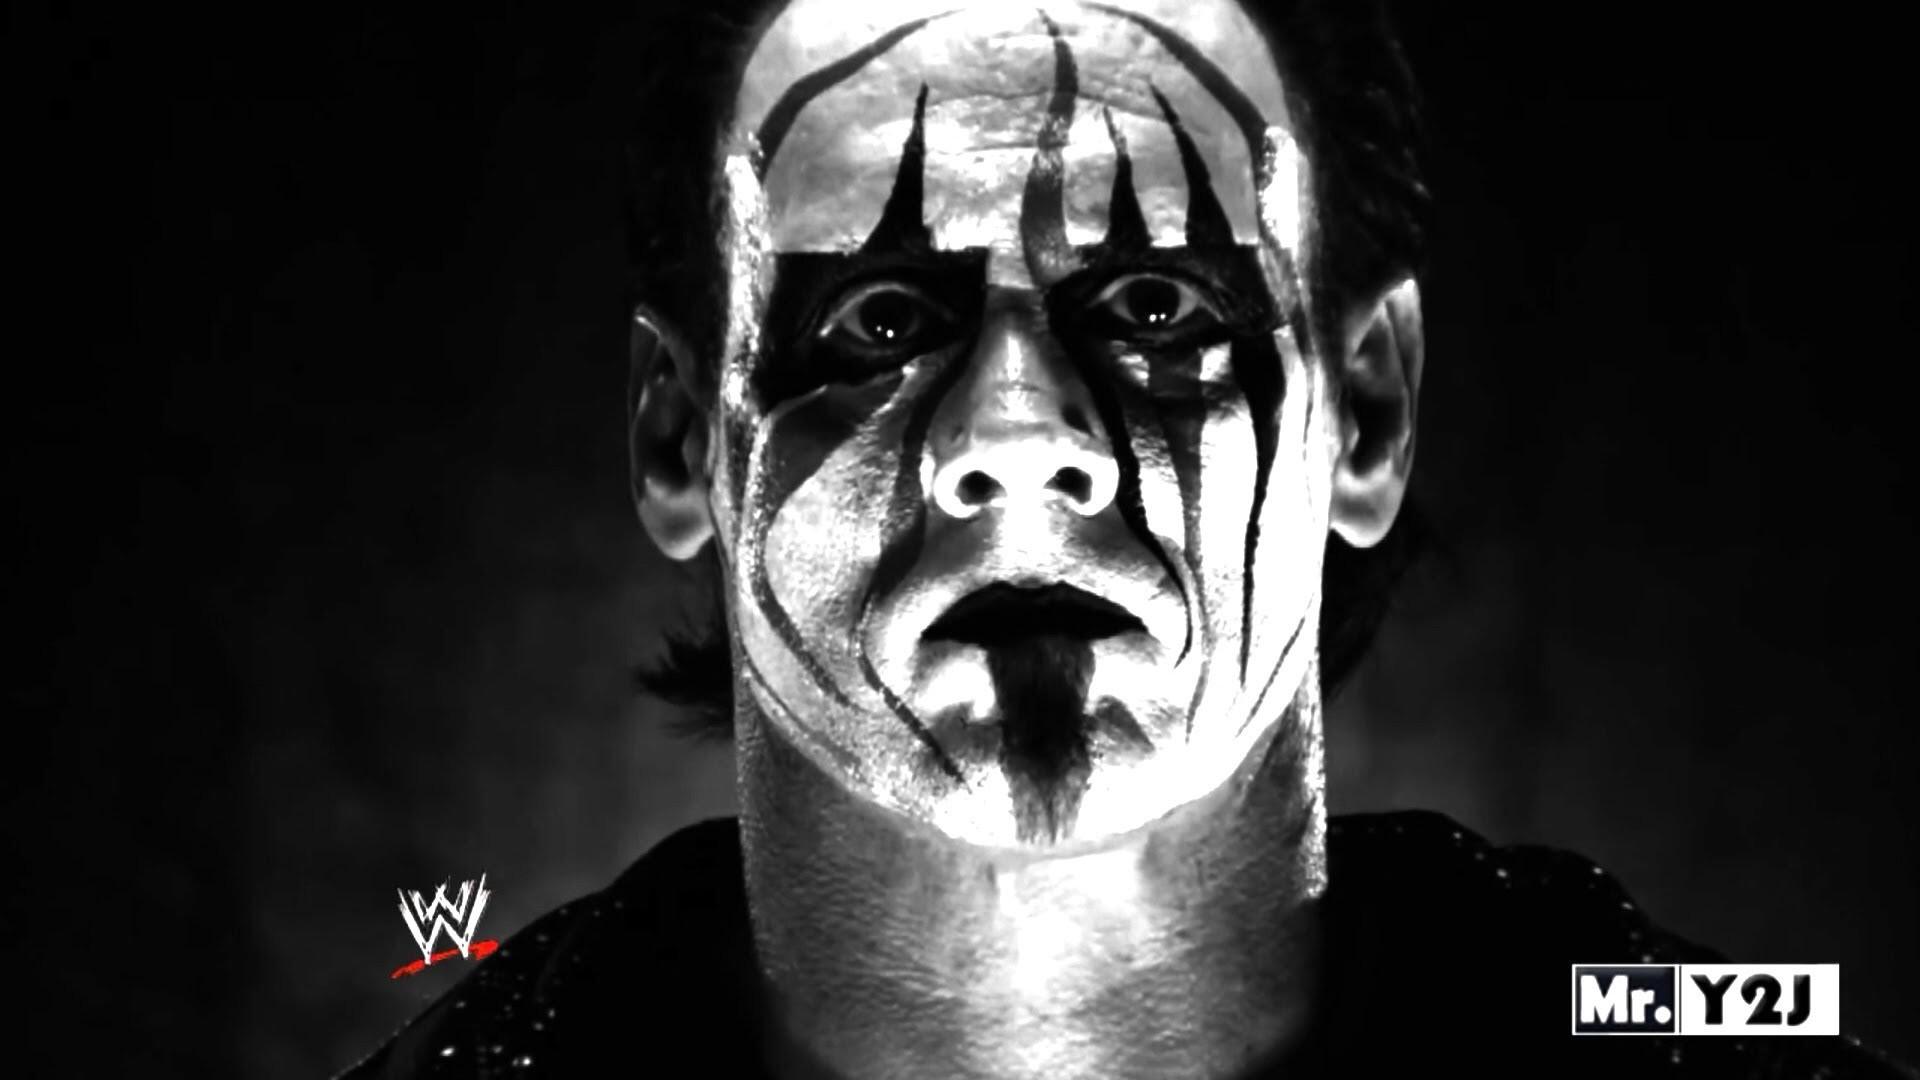 STING WWE HALL OF FAME WRESTLEMANIA 32 WWE RAW 1/11/16